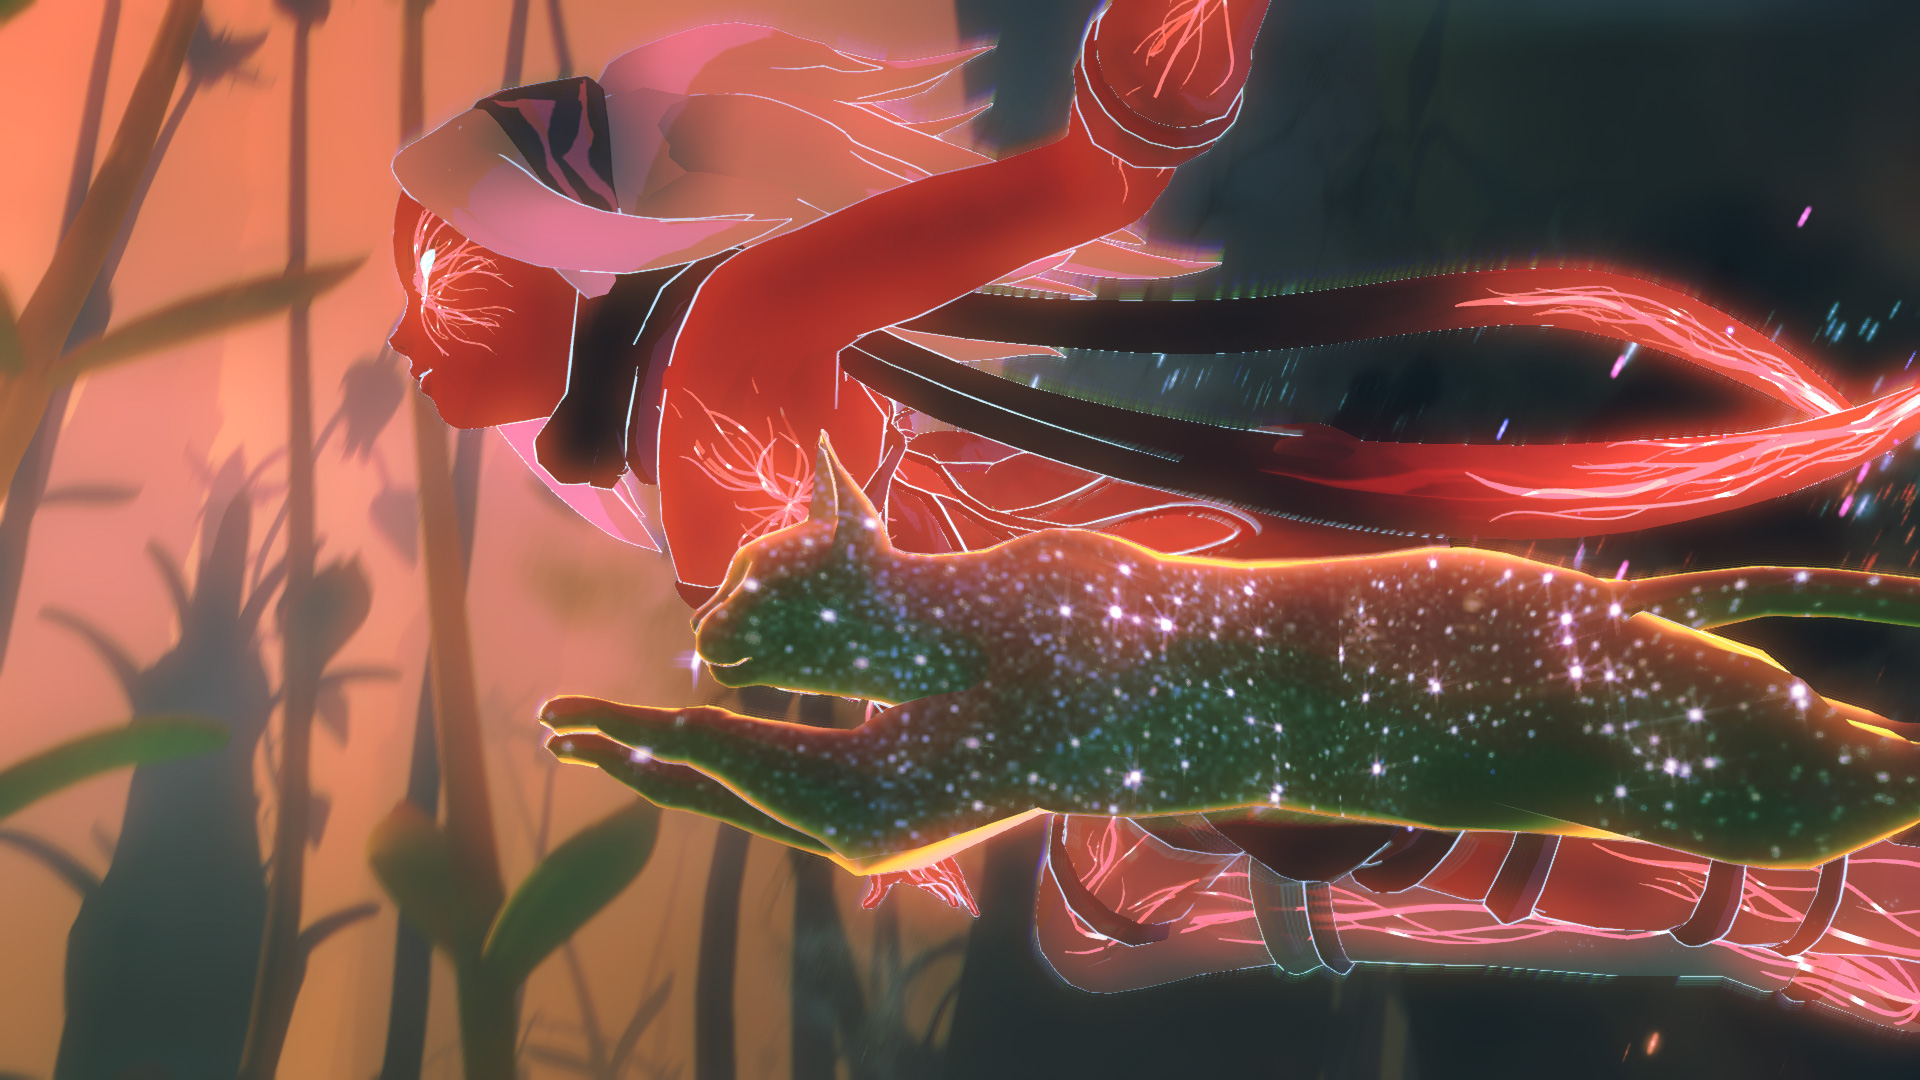 Gravity Rush 2 screenshot - Kat and Dusty flying